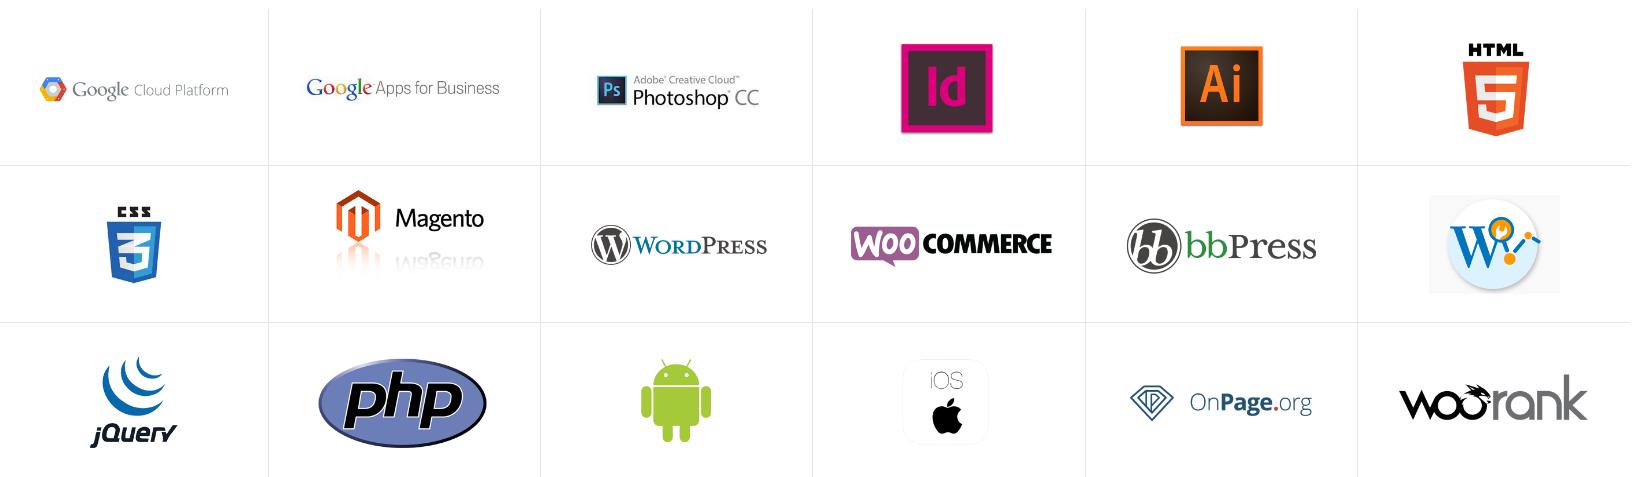 Firmenwebseiten